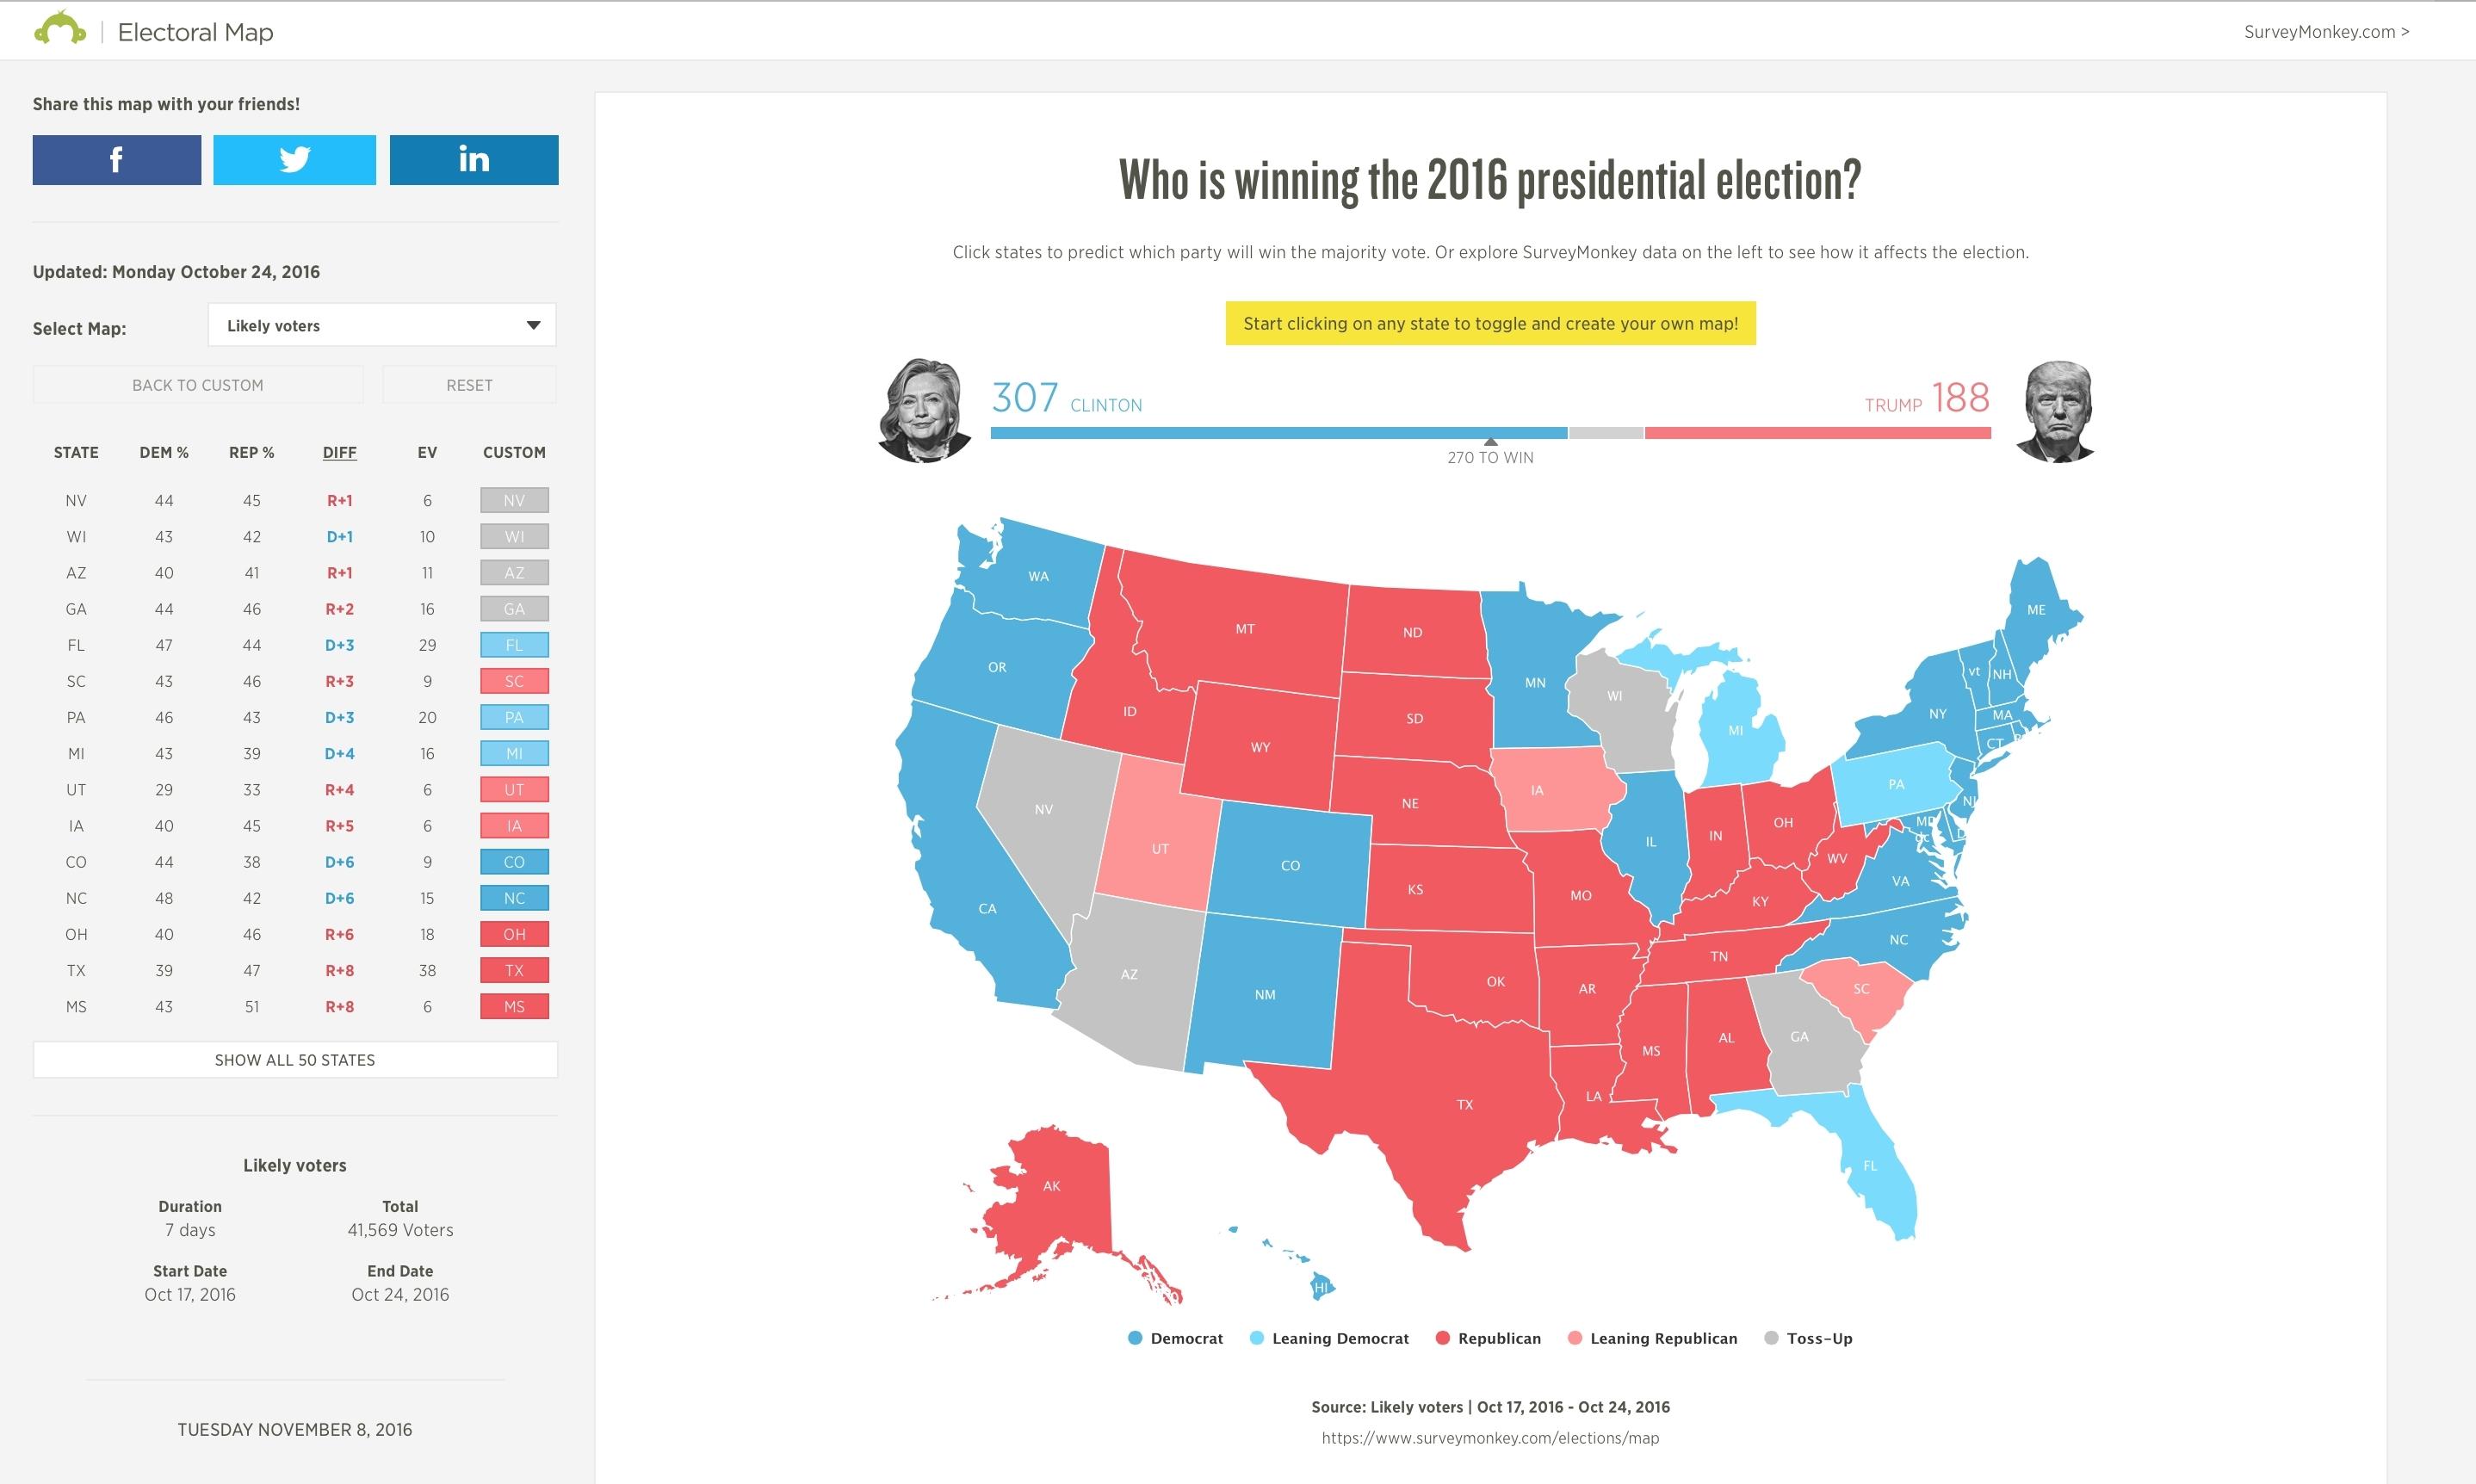 SurveyMonkey Launches RealTime Polling Map to Showcase Latest